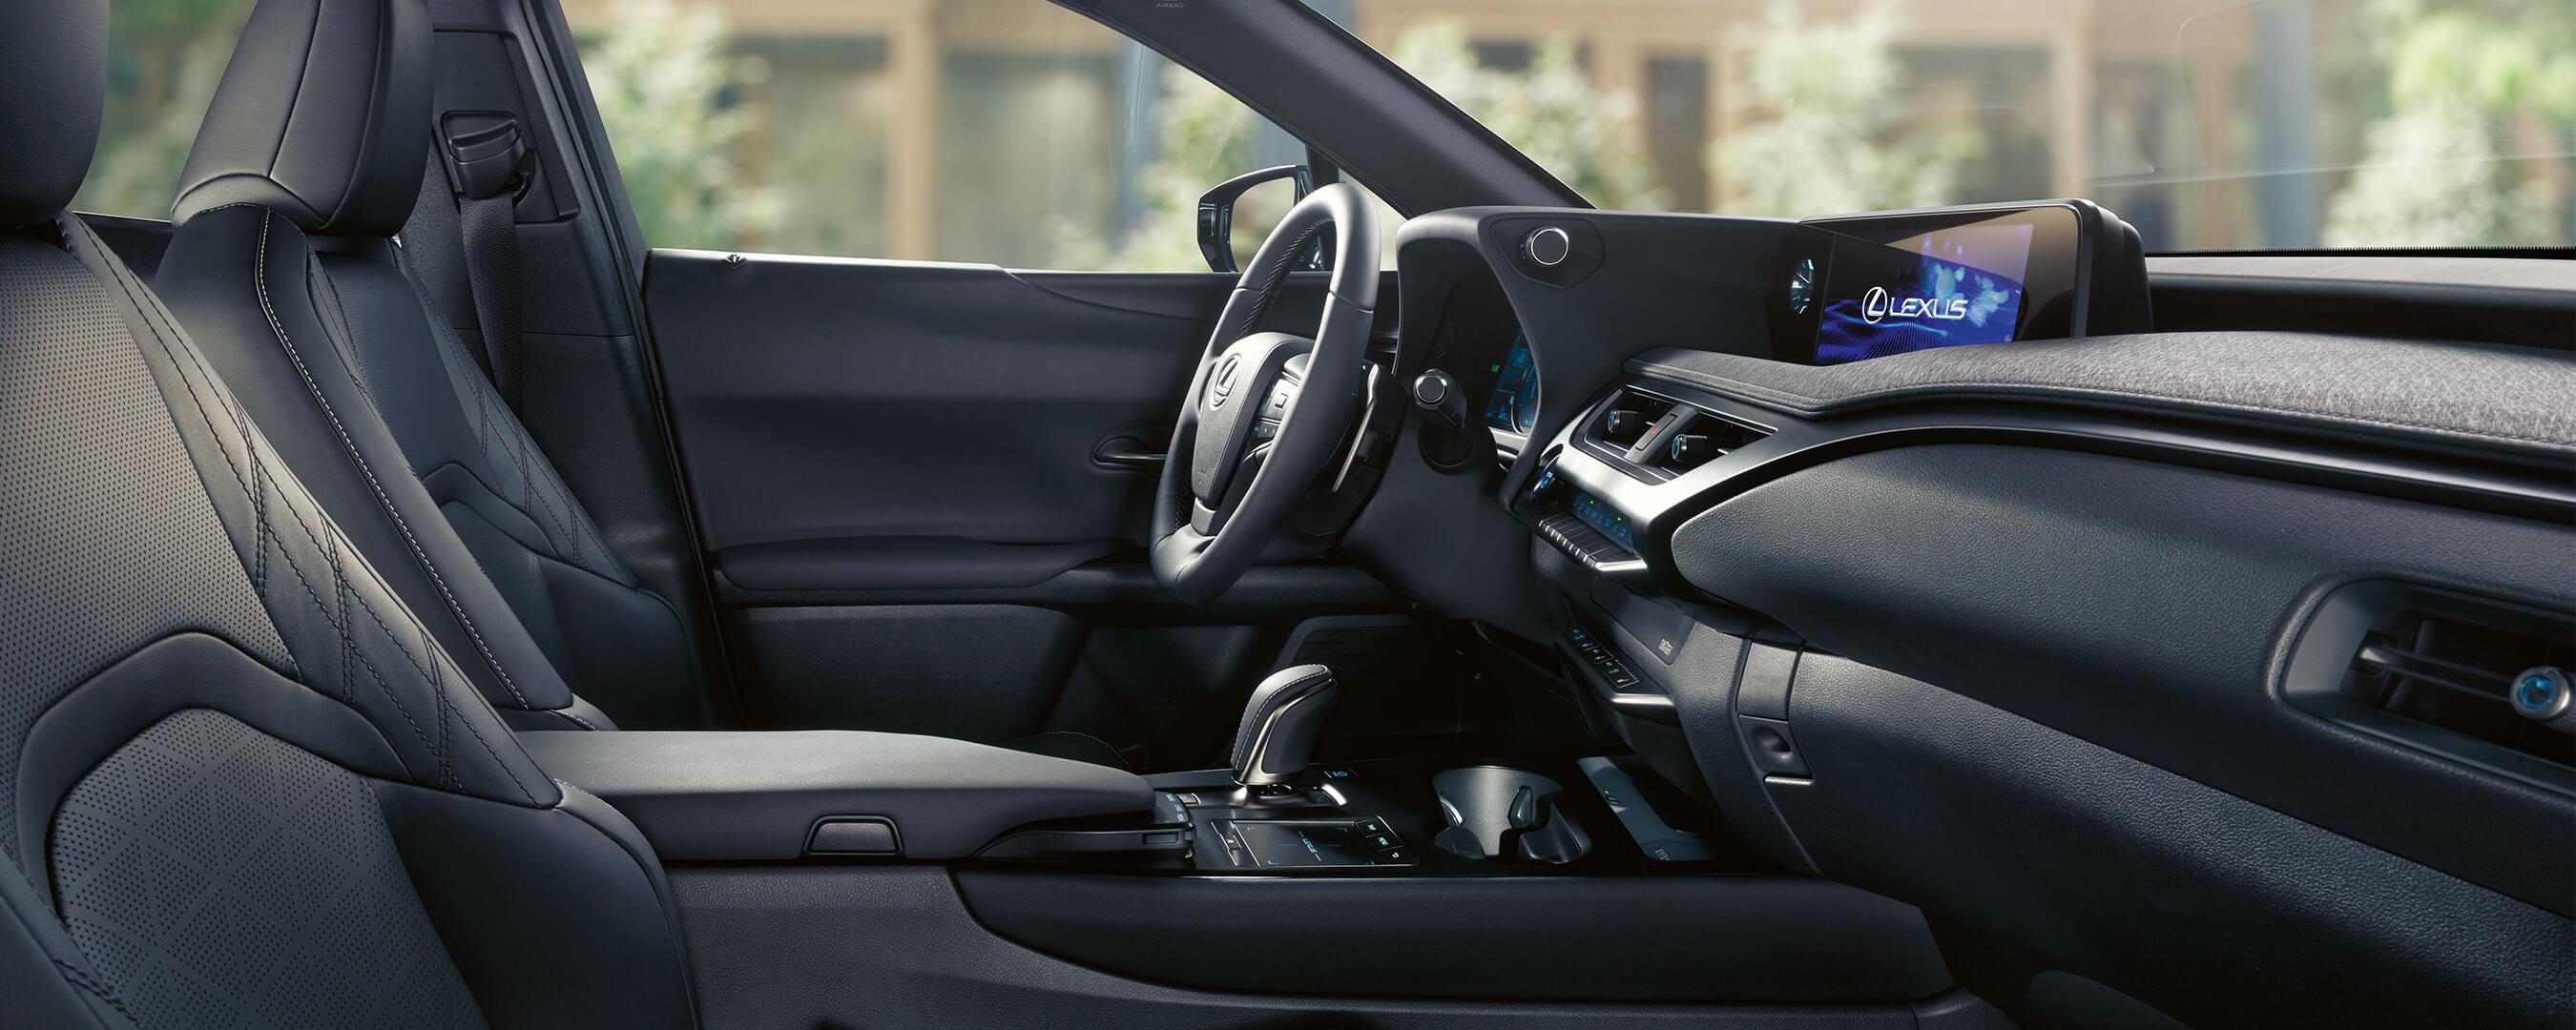 2021 lexus ux 300e experience interior front